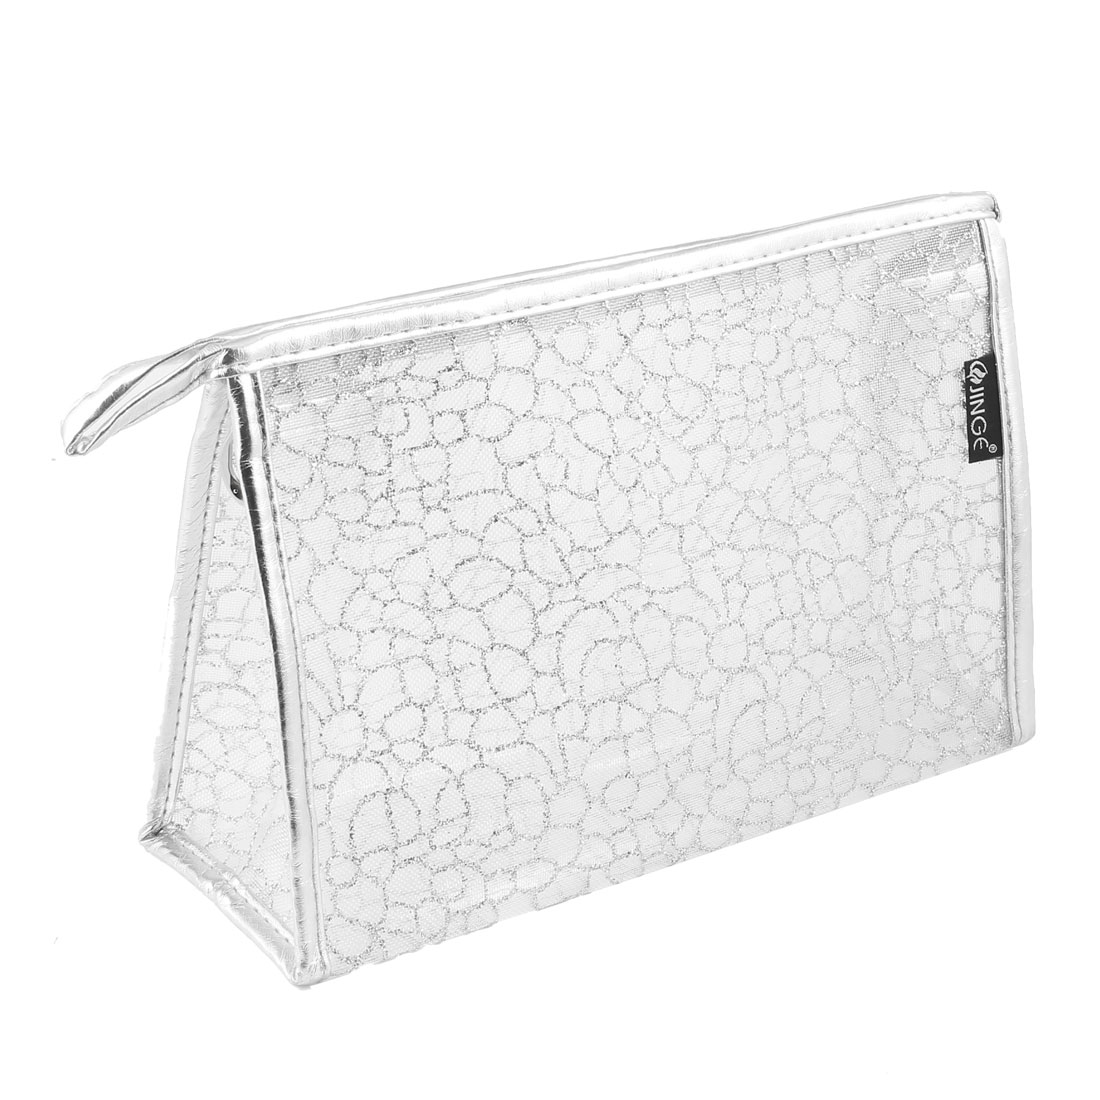 Silver Tone Meshy Exterior Zippered PVC Nylon Cosmetic Makeup Bag Case Holder Organizer